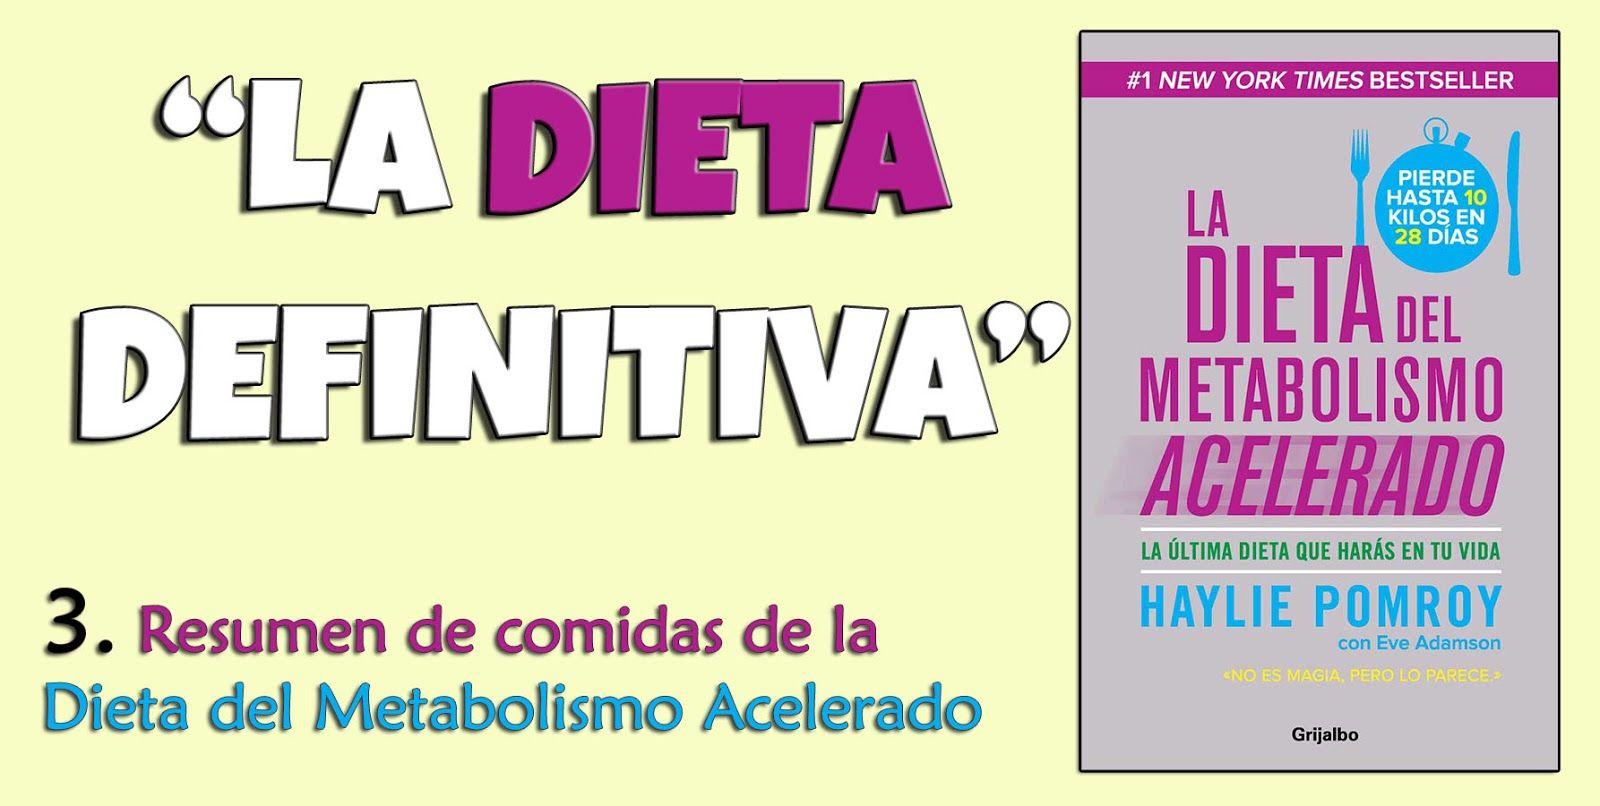 RESUMEN comidas Dieta del metabolismo acelerado - Dieta..